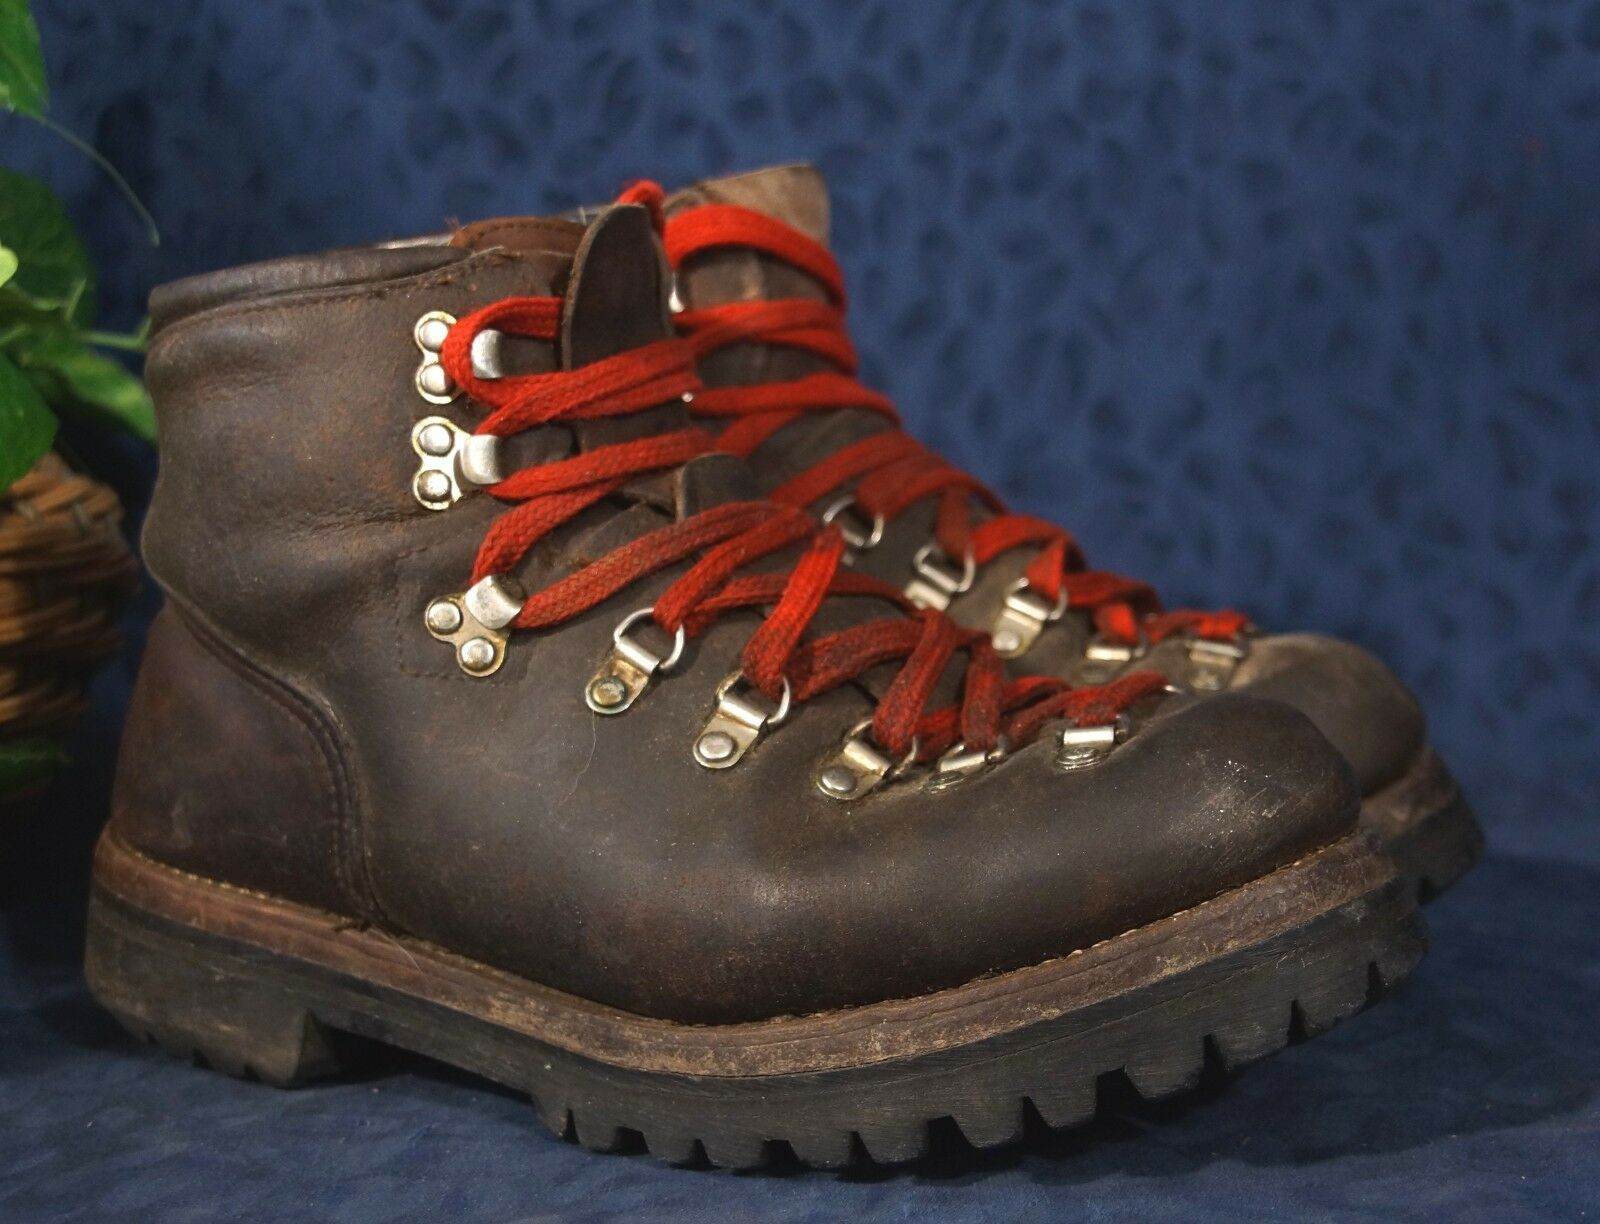 Rustic braun VASQUE HIKING HIKING HIKING Mountaineering Stiefel 8M 99b995